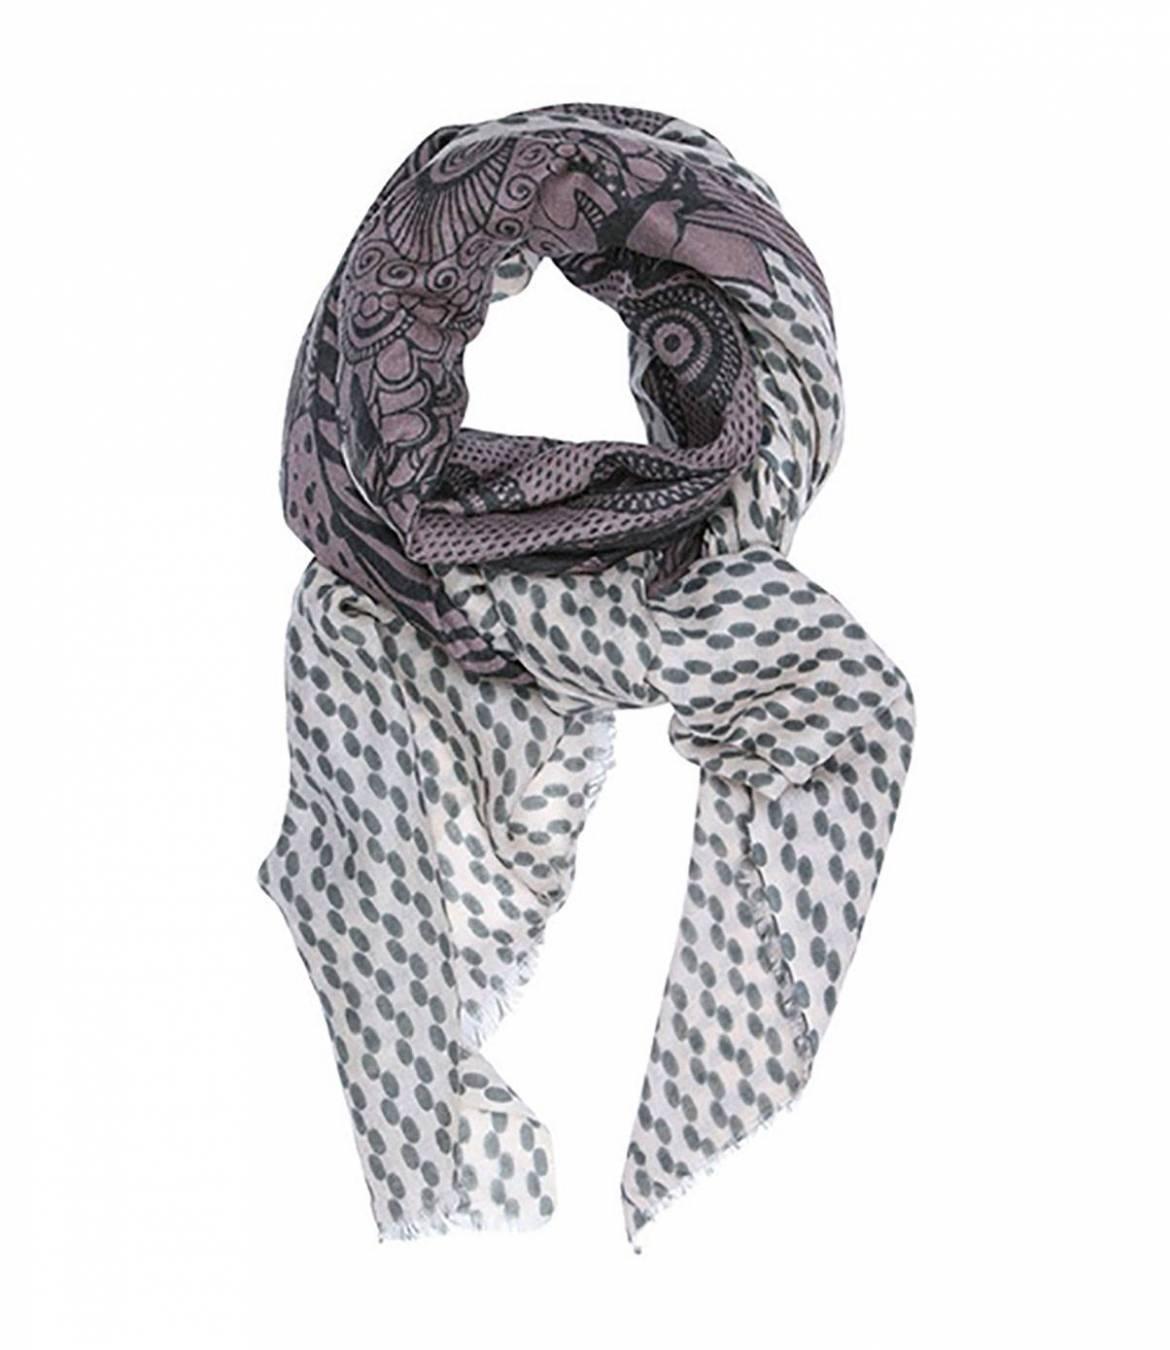 COOR Women's Wool Scarf 80x190 cm Storiatipic - 1